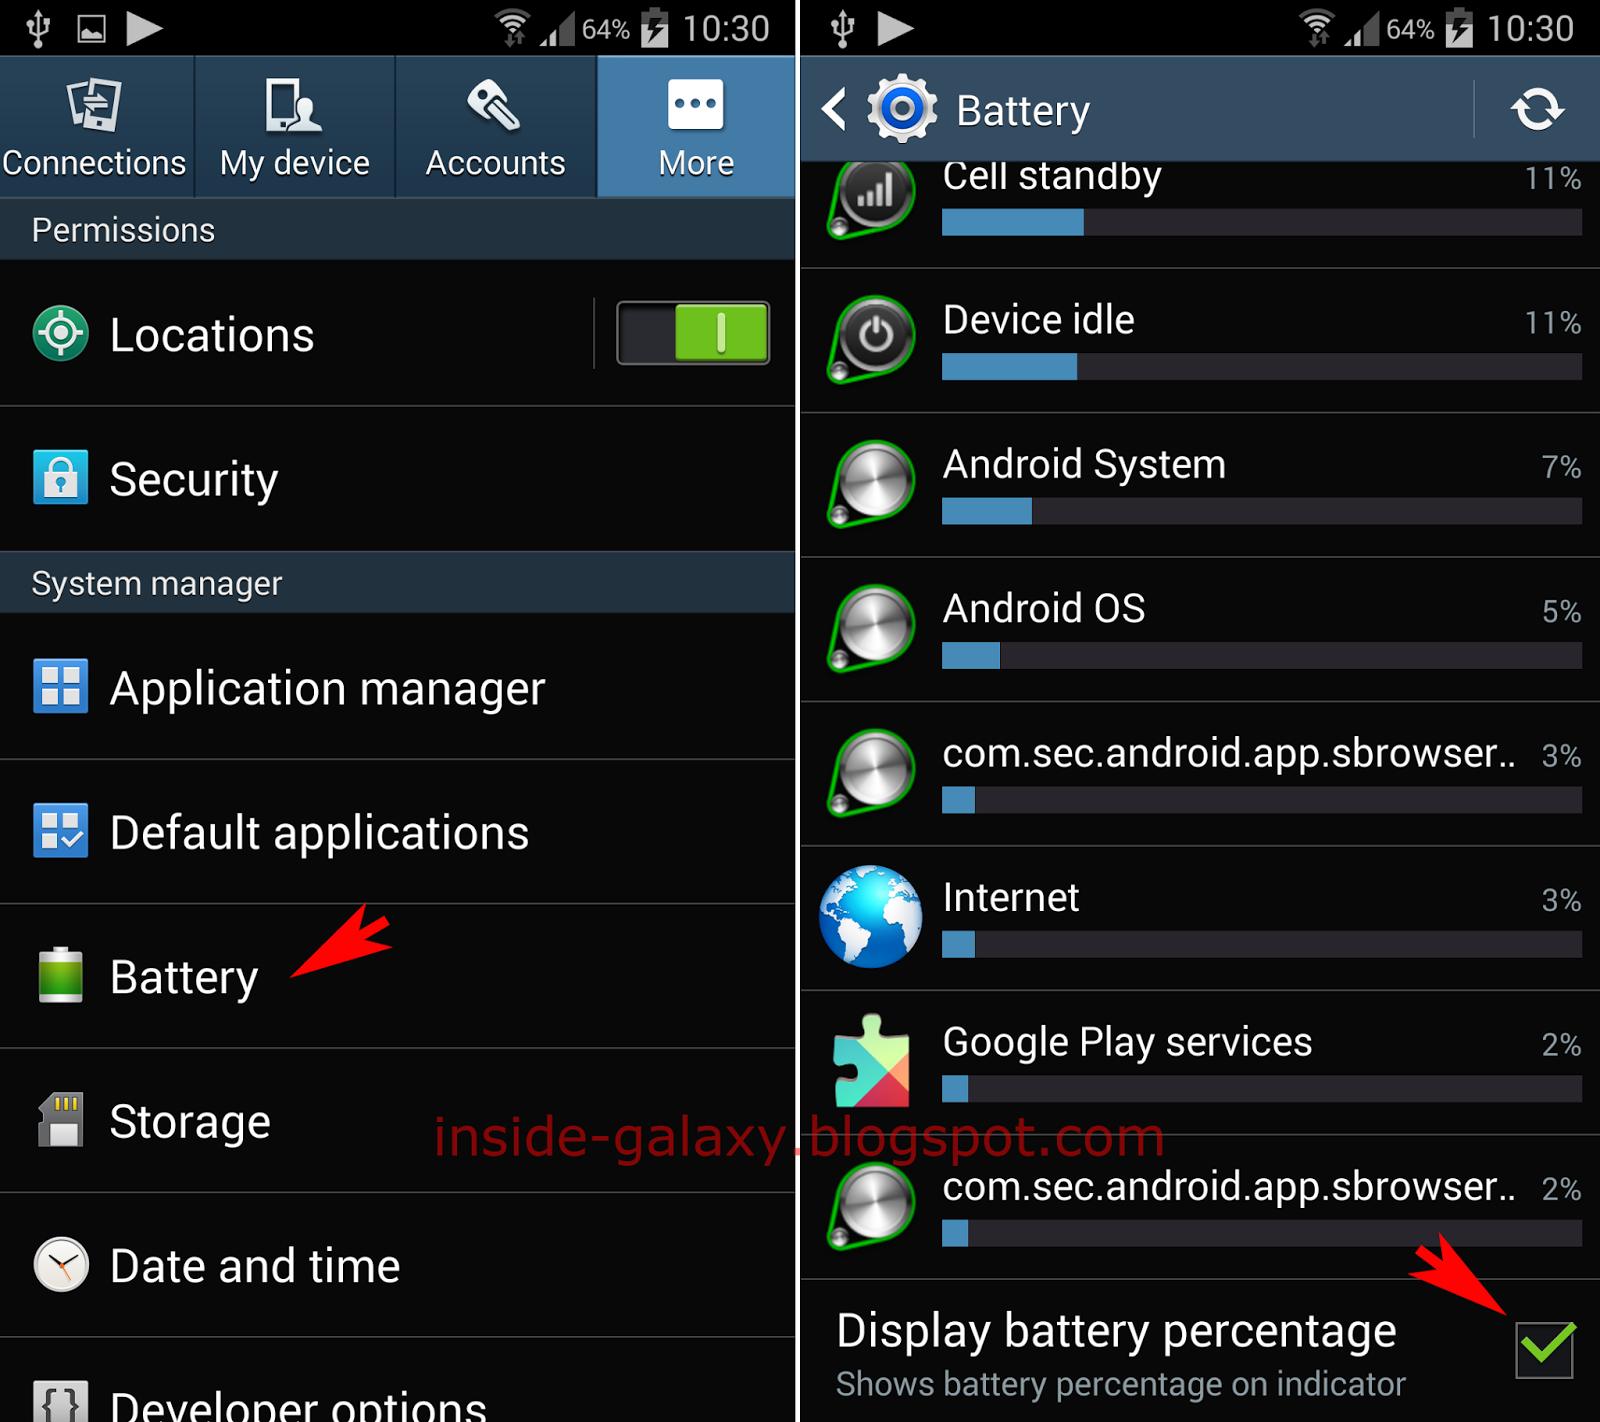 Samsung S4 Battery Percentage Bar